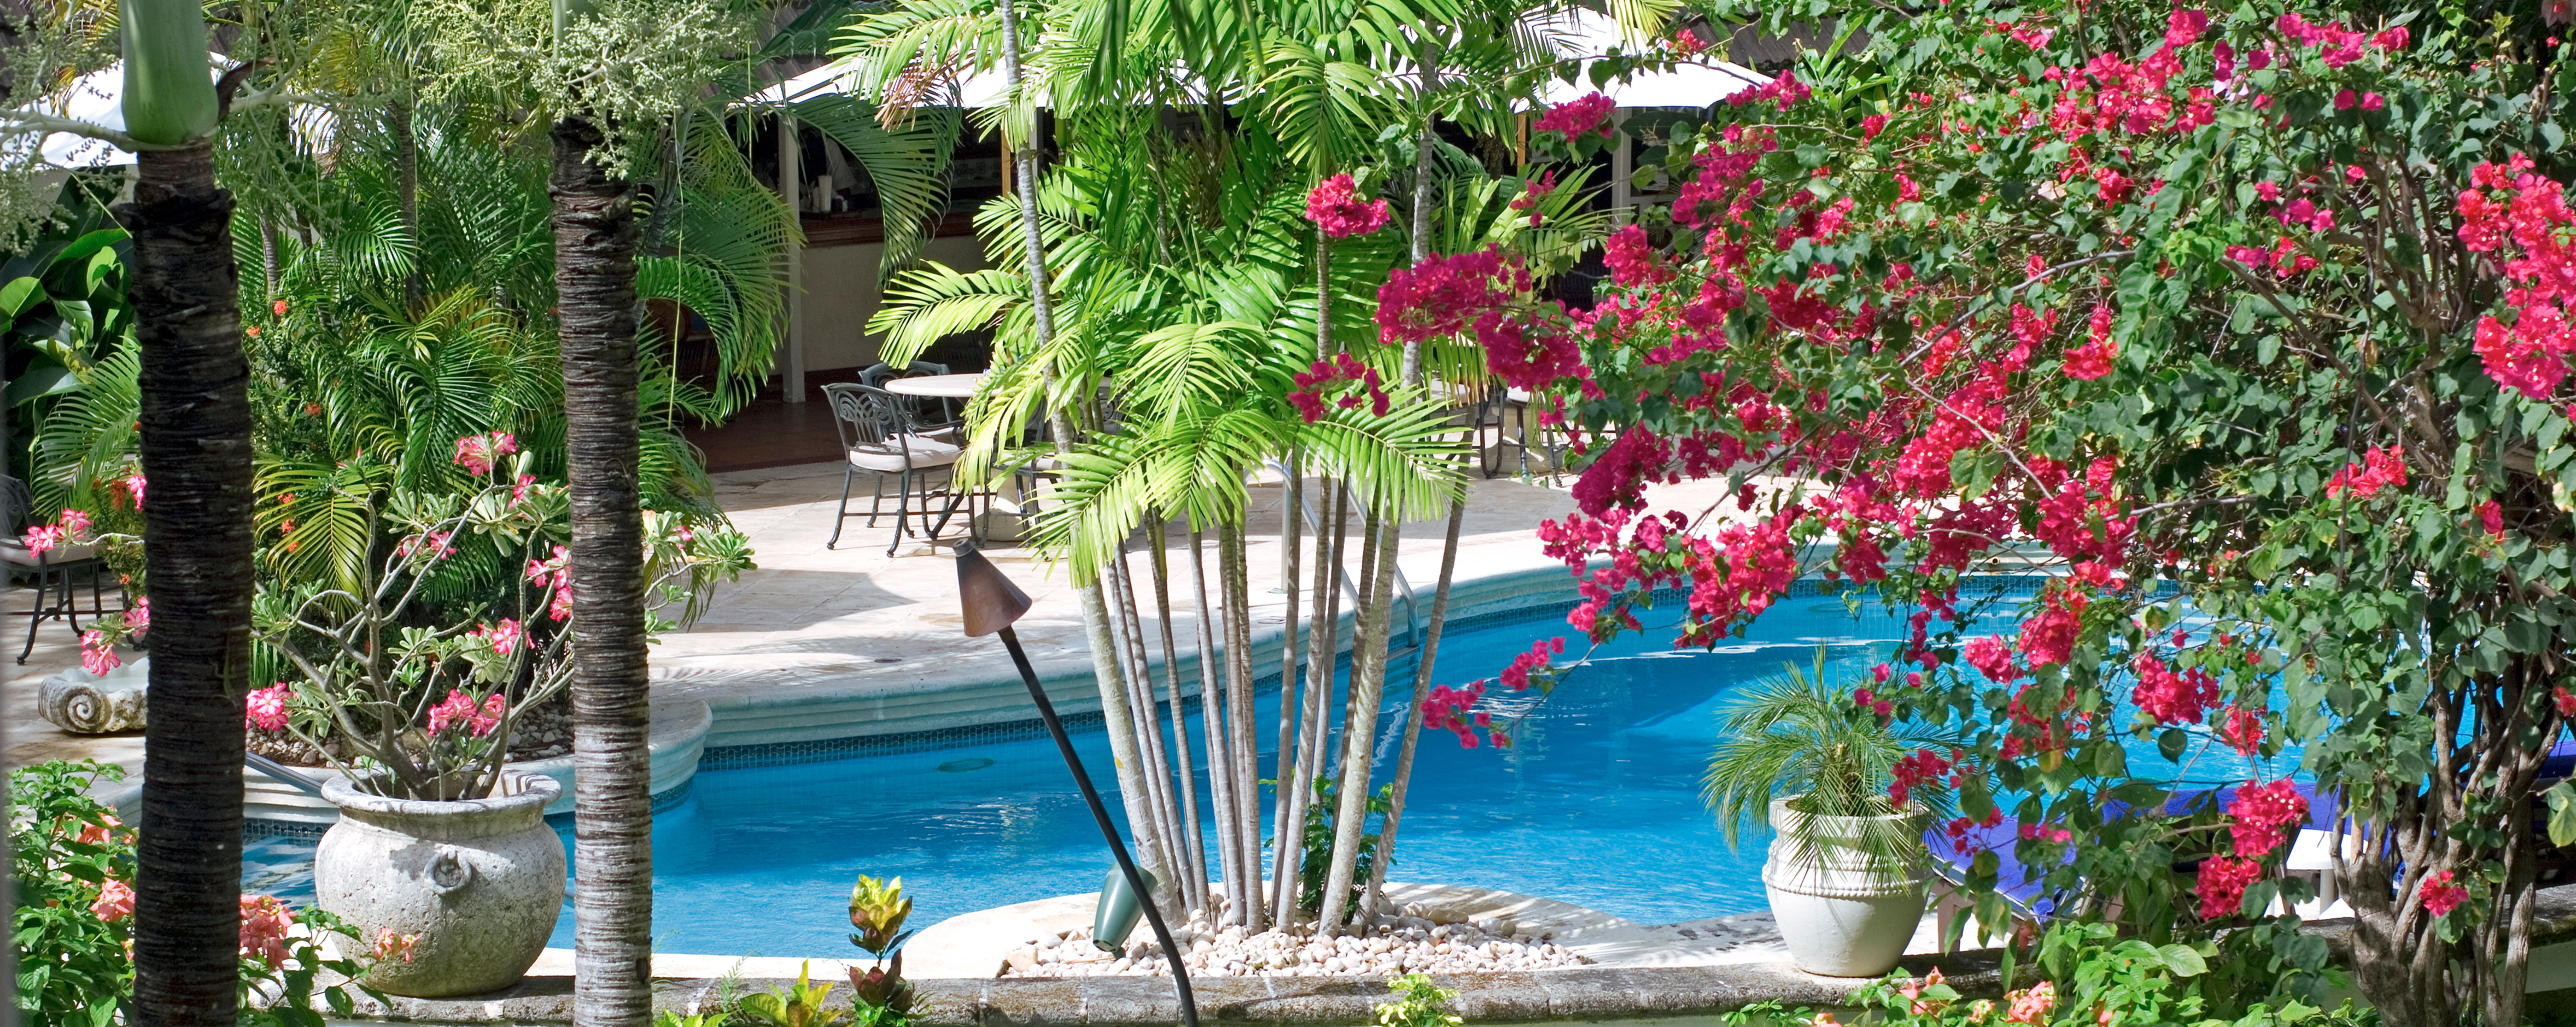 garden-pool-sandpiper-hotel